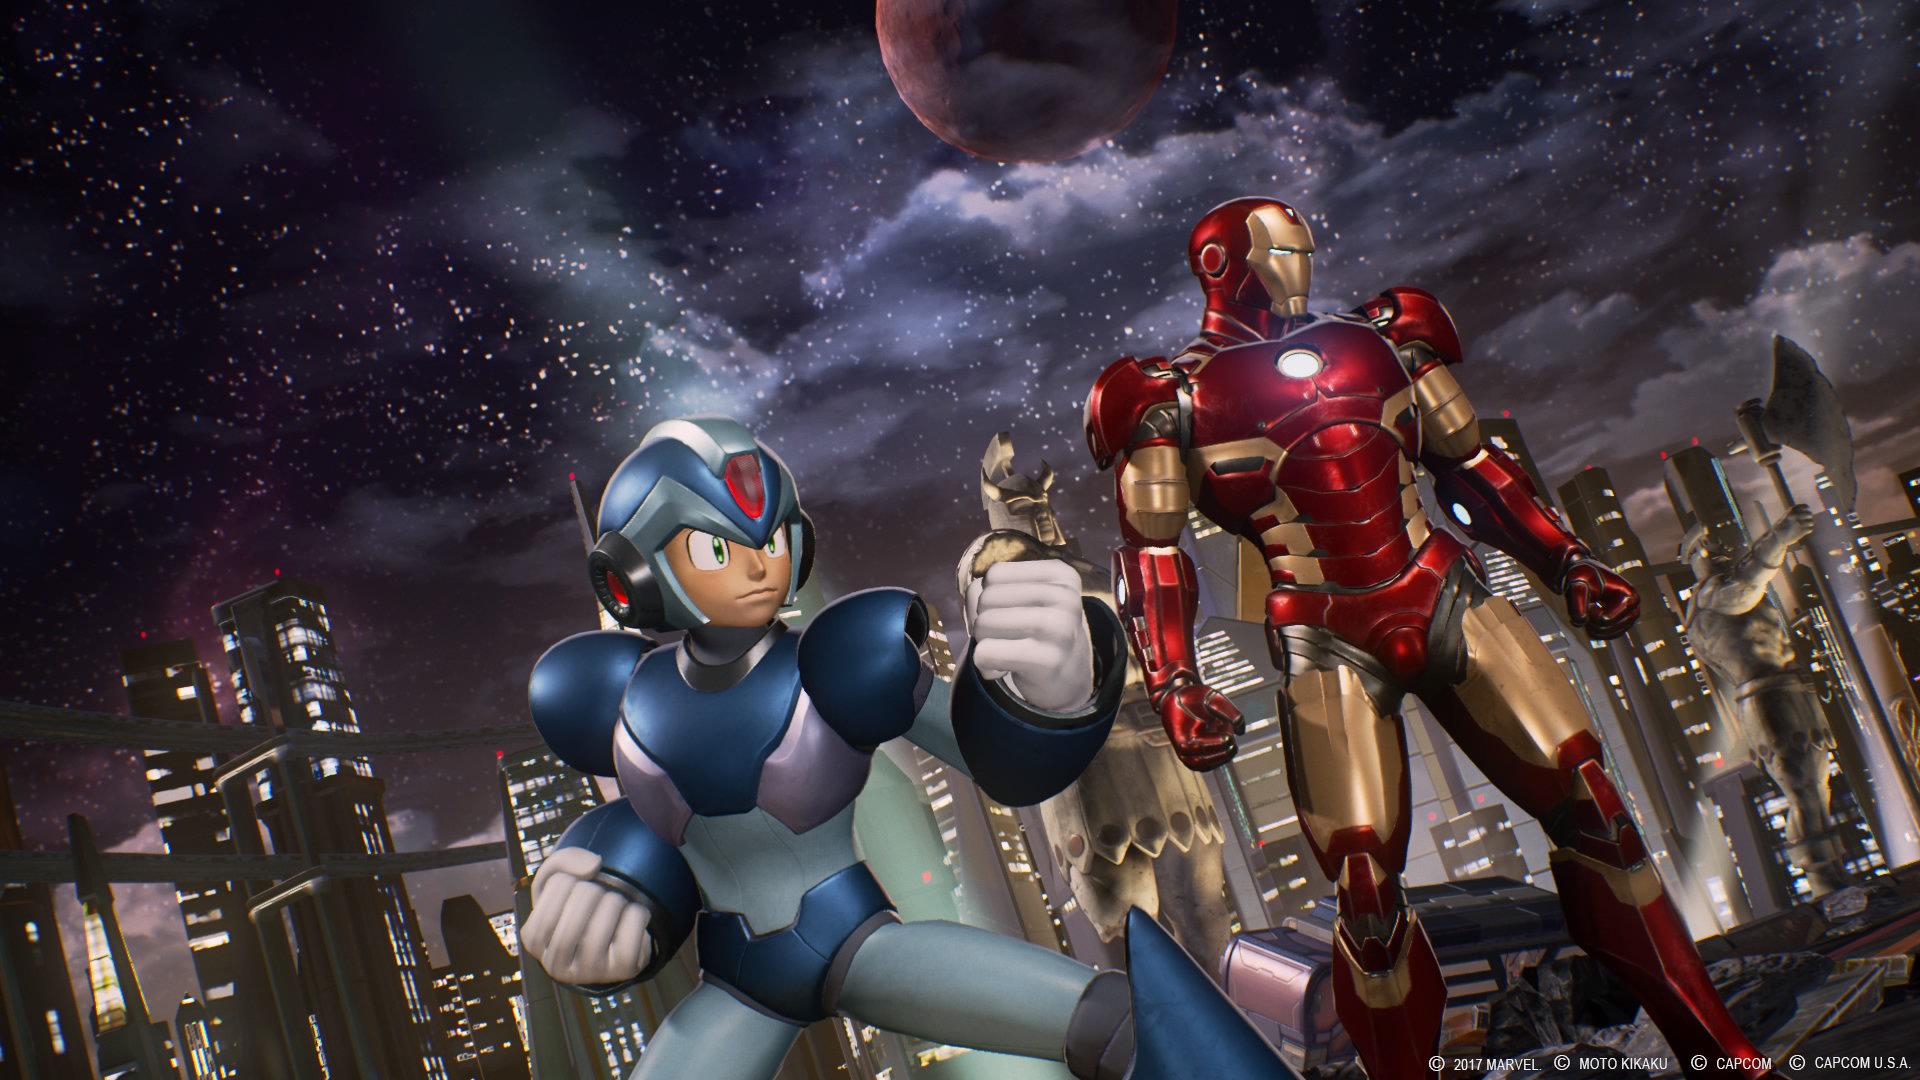 Marvel vs Capcom Infinite combat